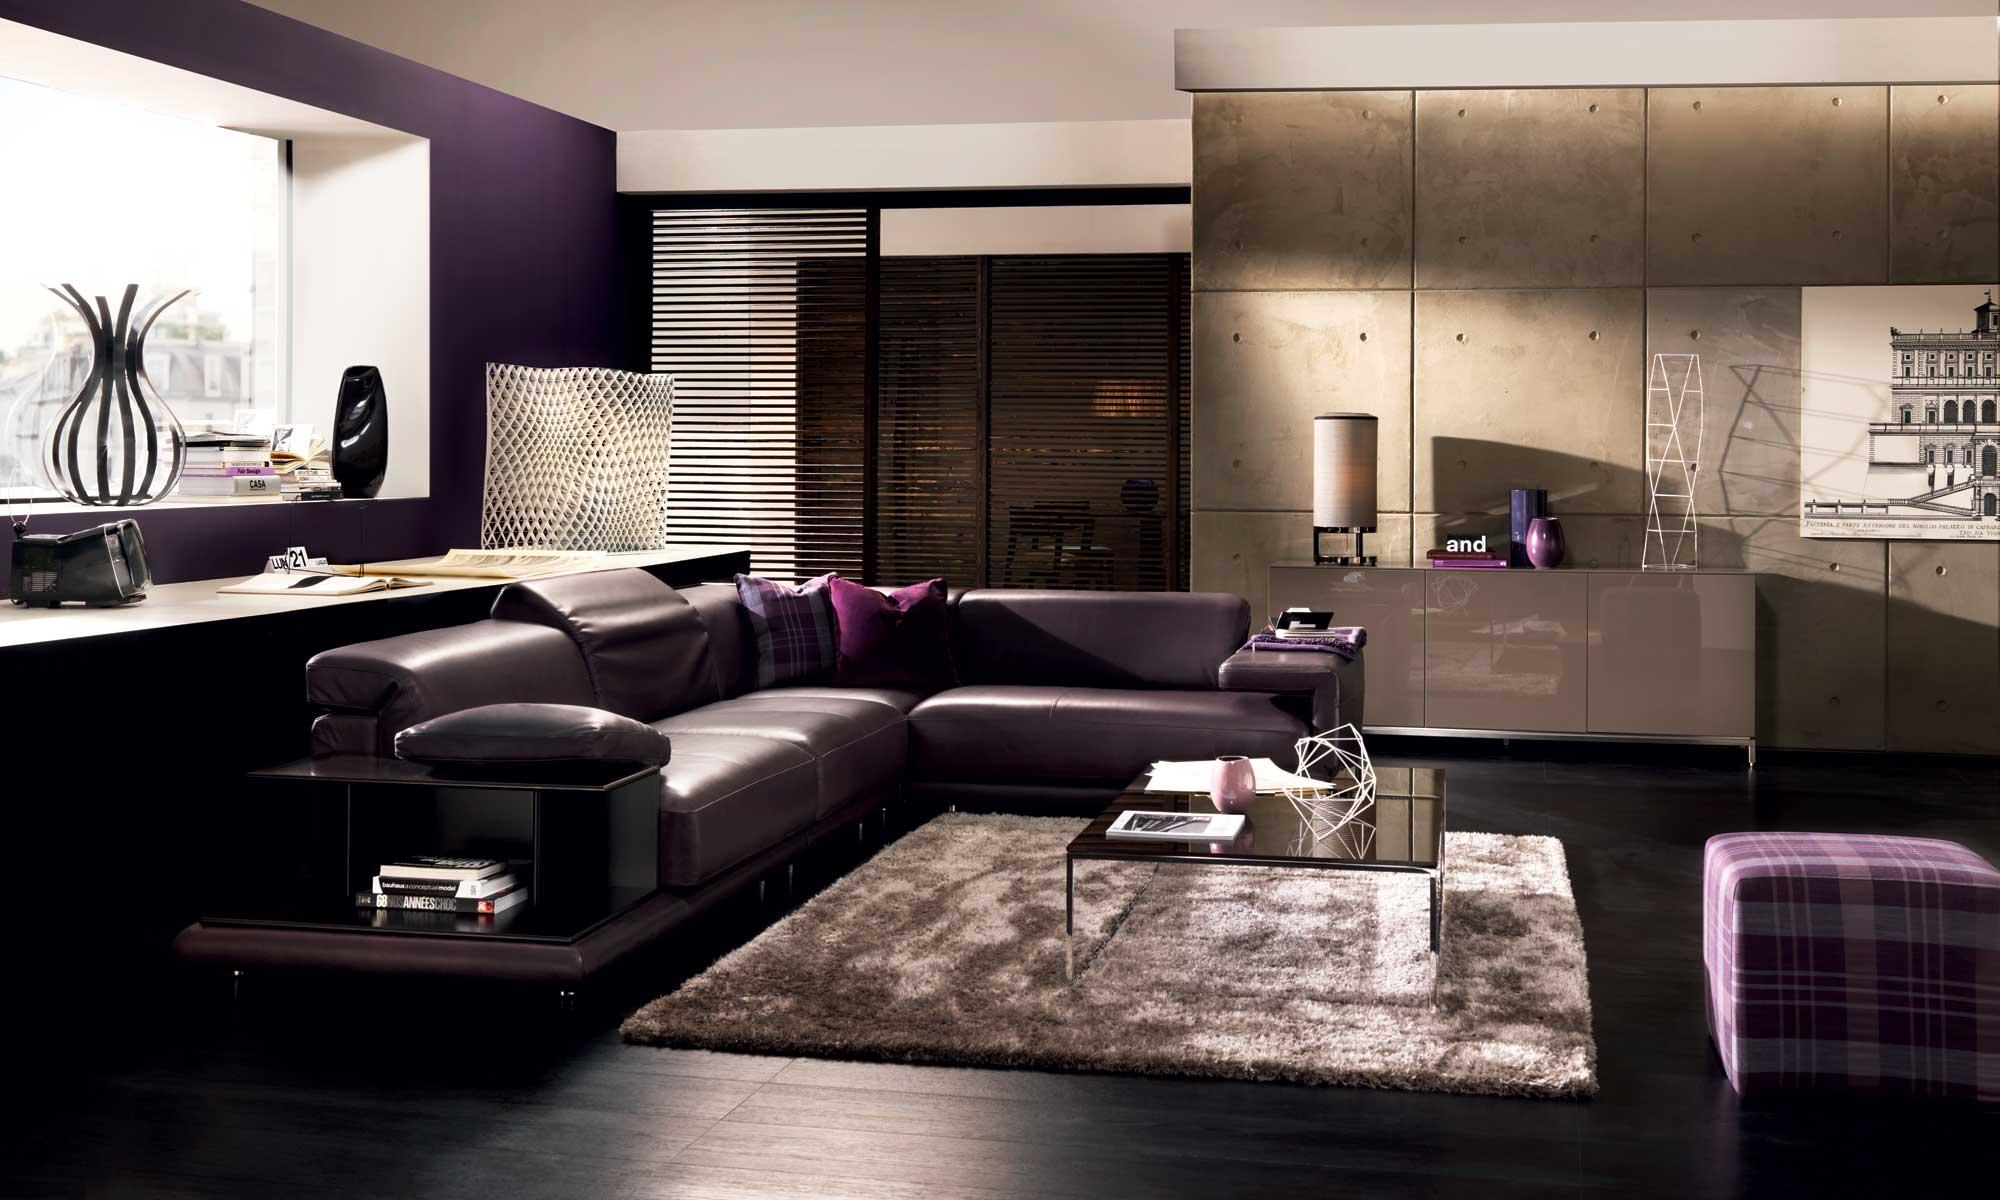 Italian Furniture Natuzzi Home Design Ideas And Pictures # Muebles Natuzzi Puerto Rico